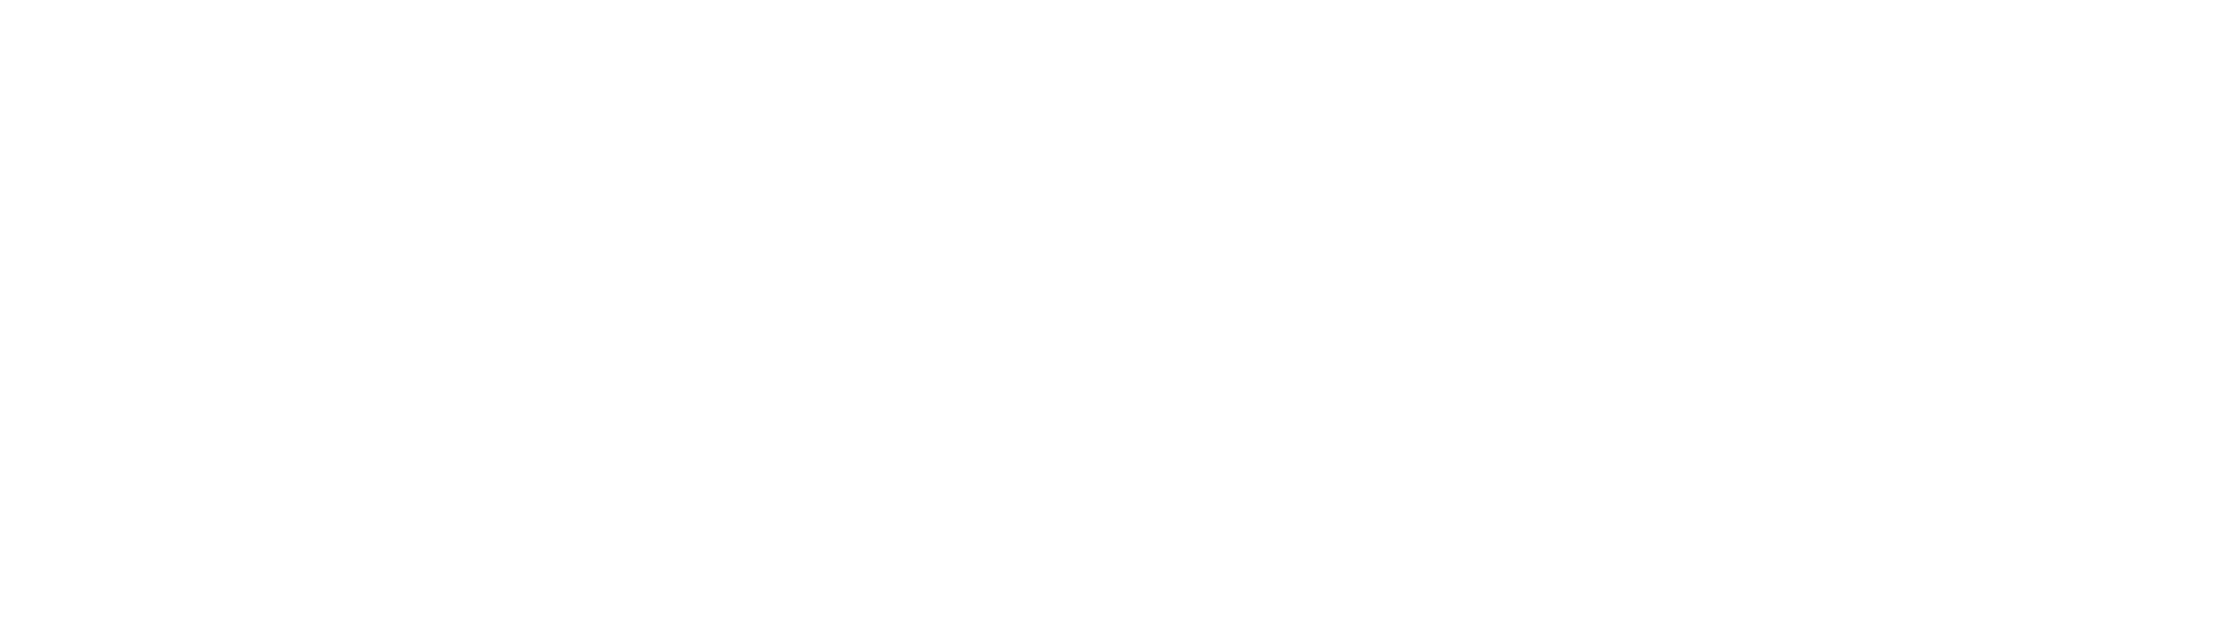 logo cen elcano blanco png